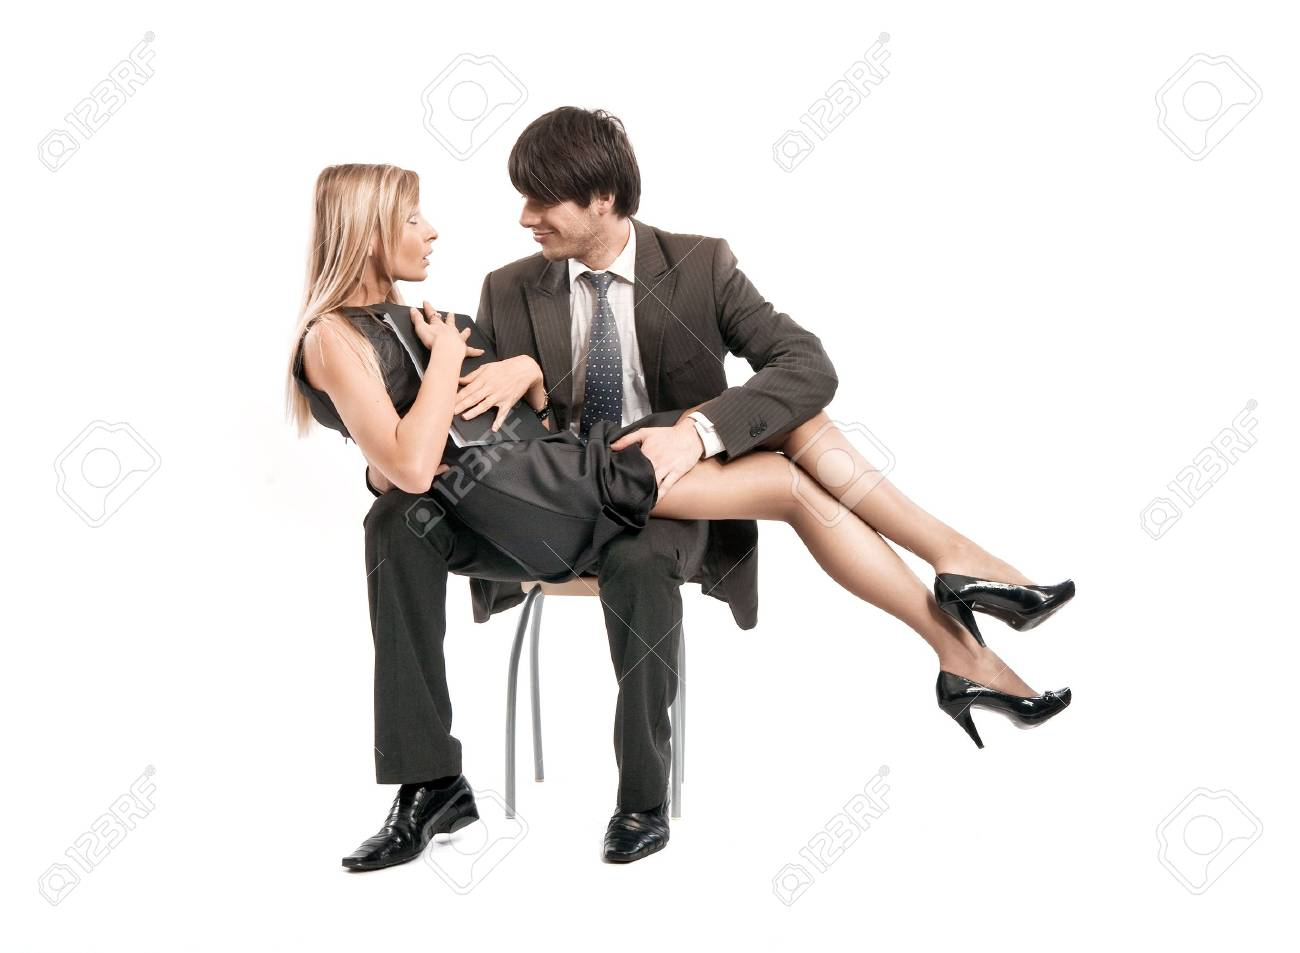 Relationships between boss and secretary Stock Photo - 8531775